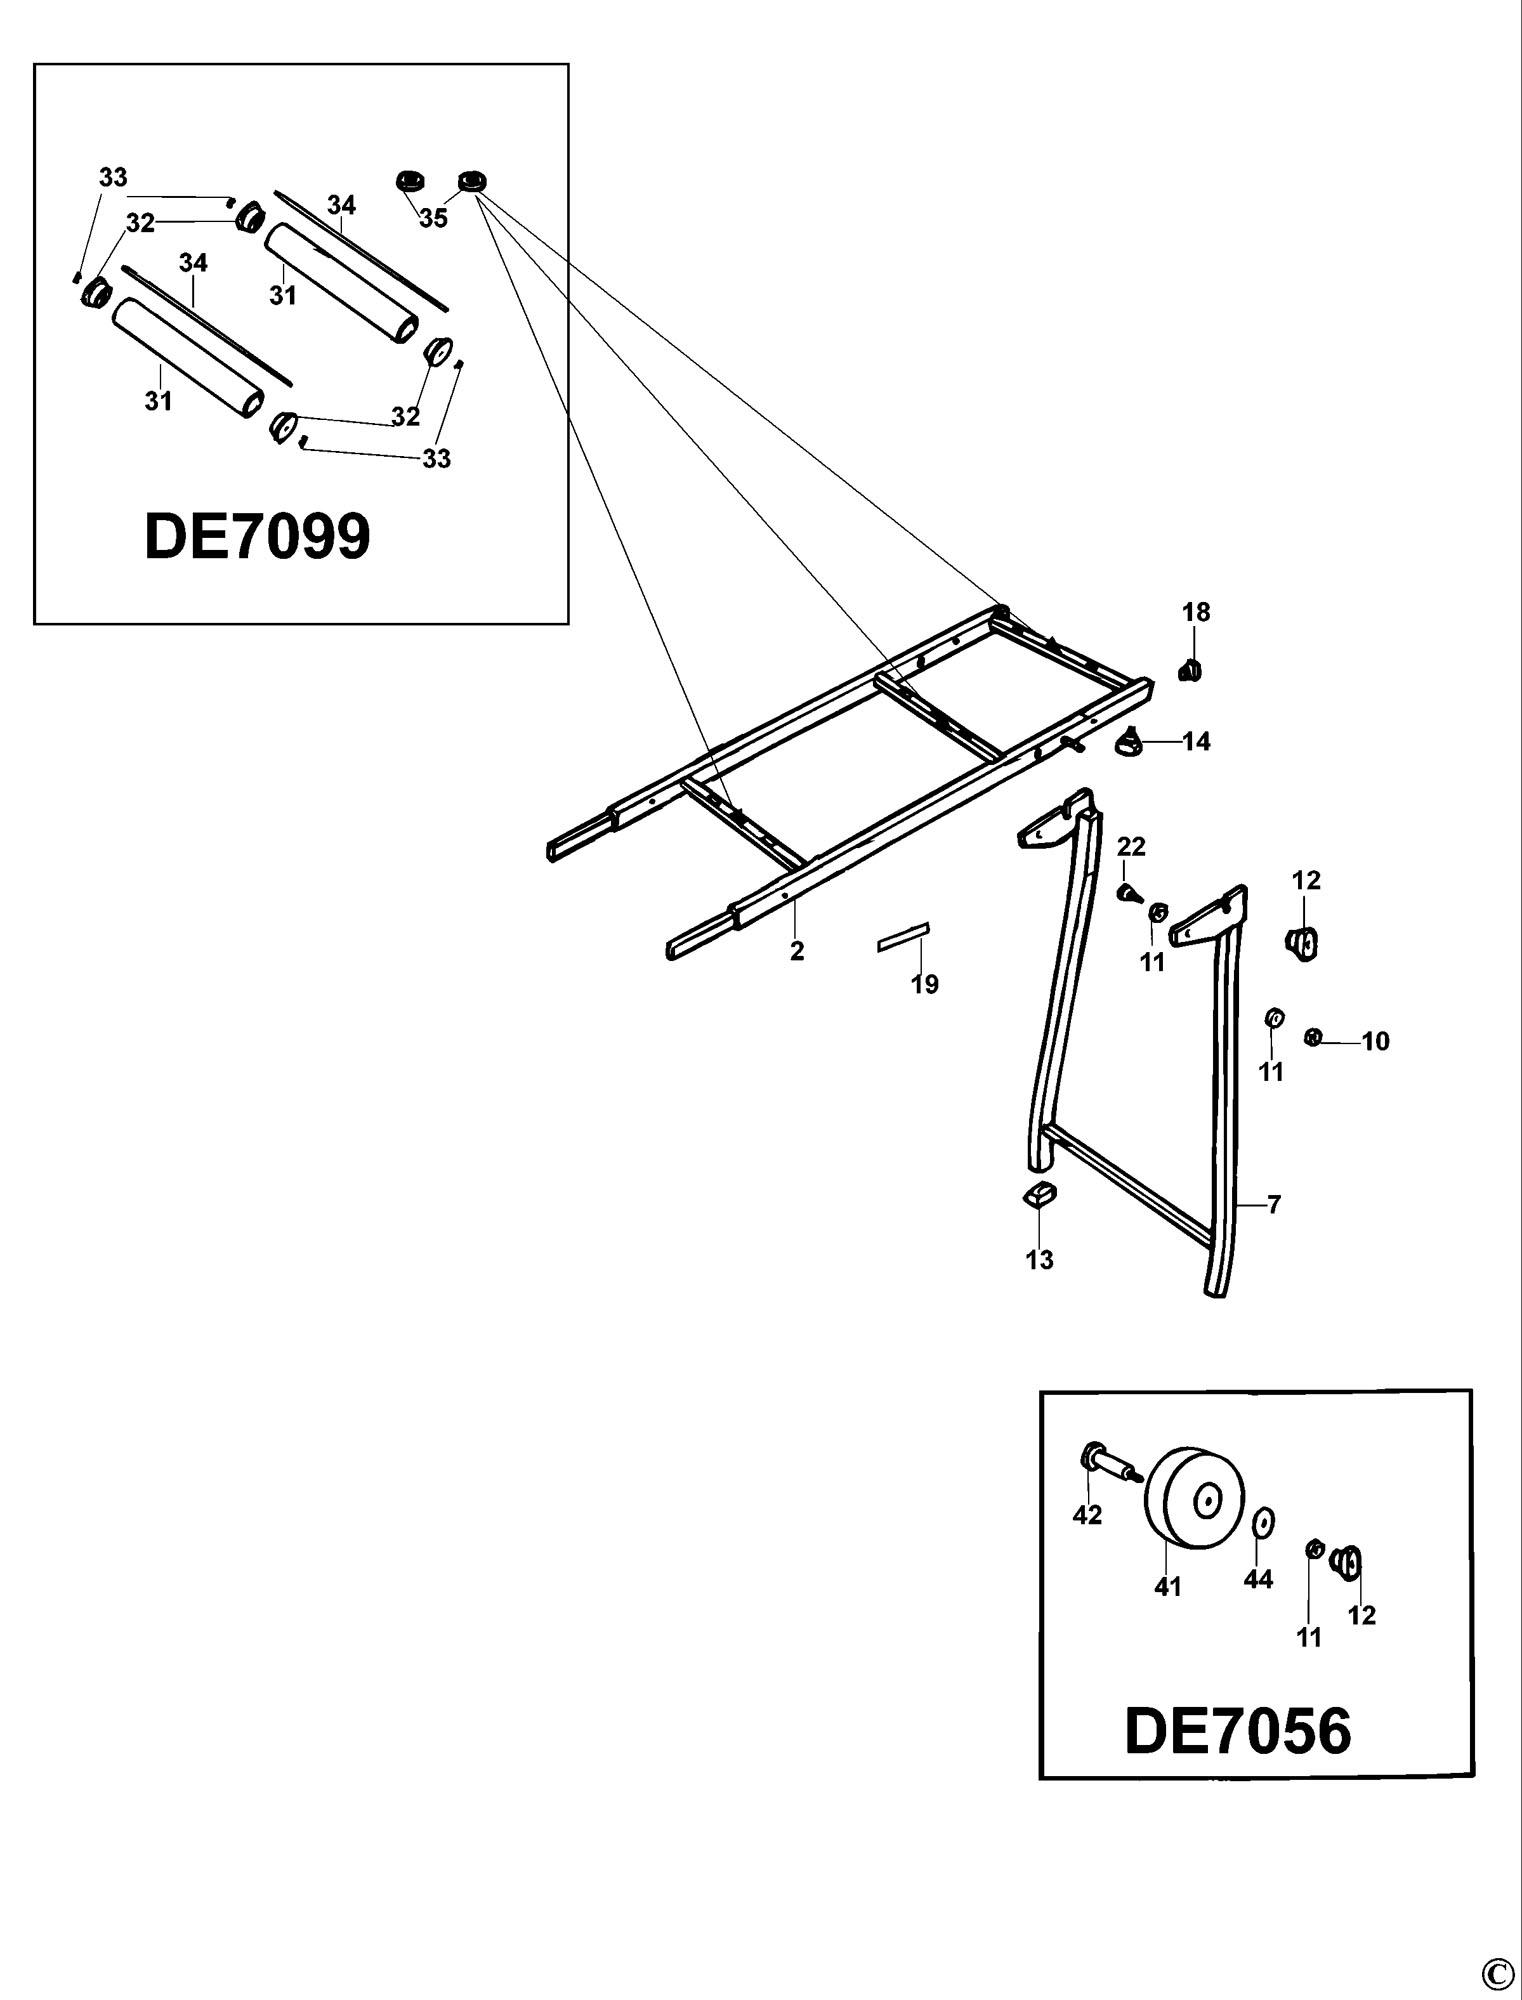 Spares For Dewalt De7099 Roller Support Type 4 Spare De Walt Power Tool Wiring Diagrams Click Bigger Diagram